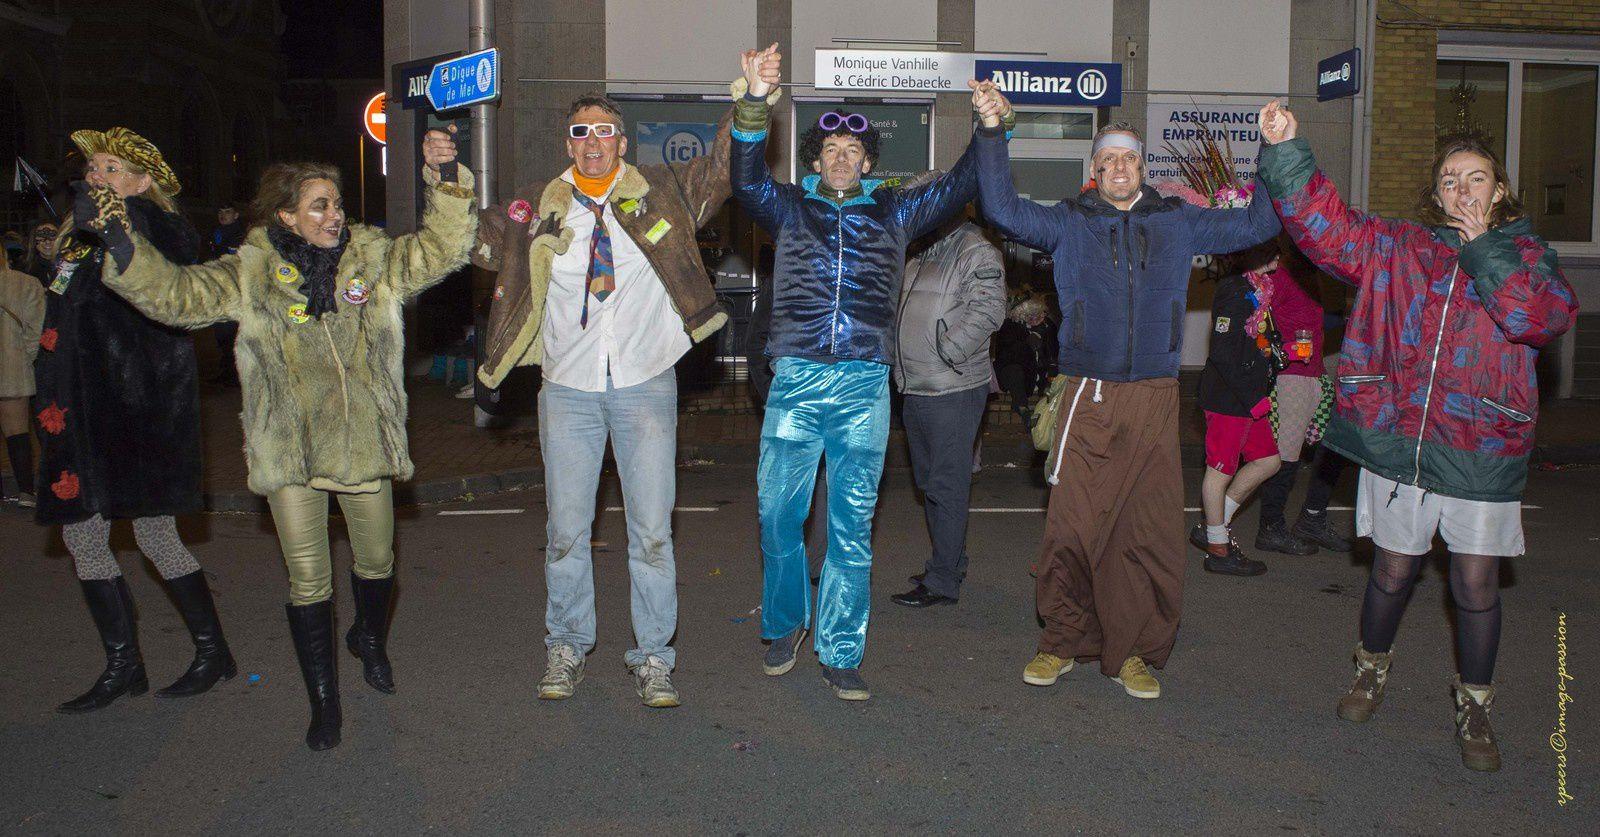 Bande de Malo-les-Bains - Carnaval de Dunkerque 2017